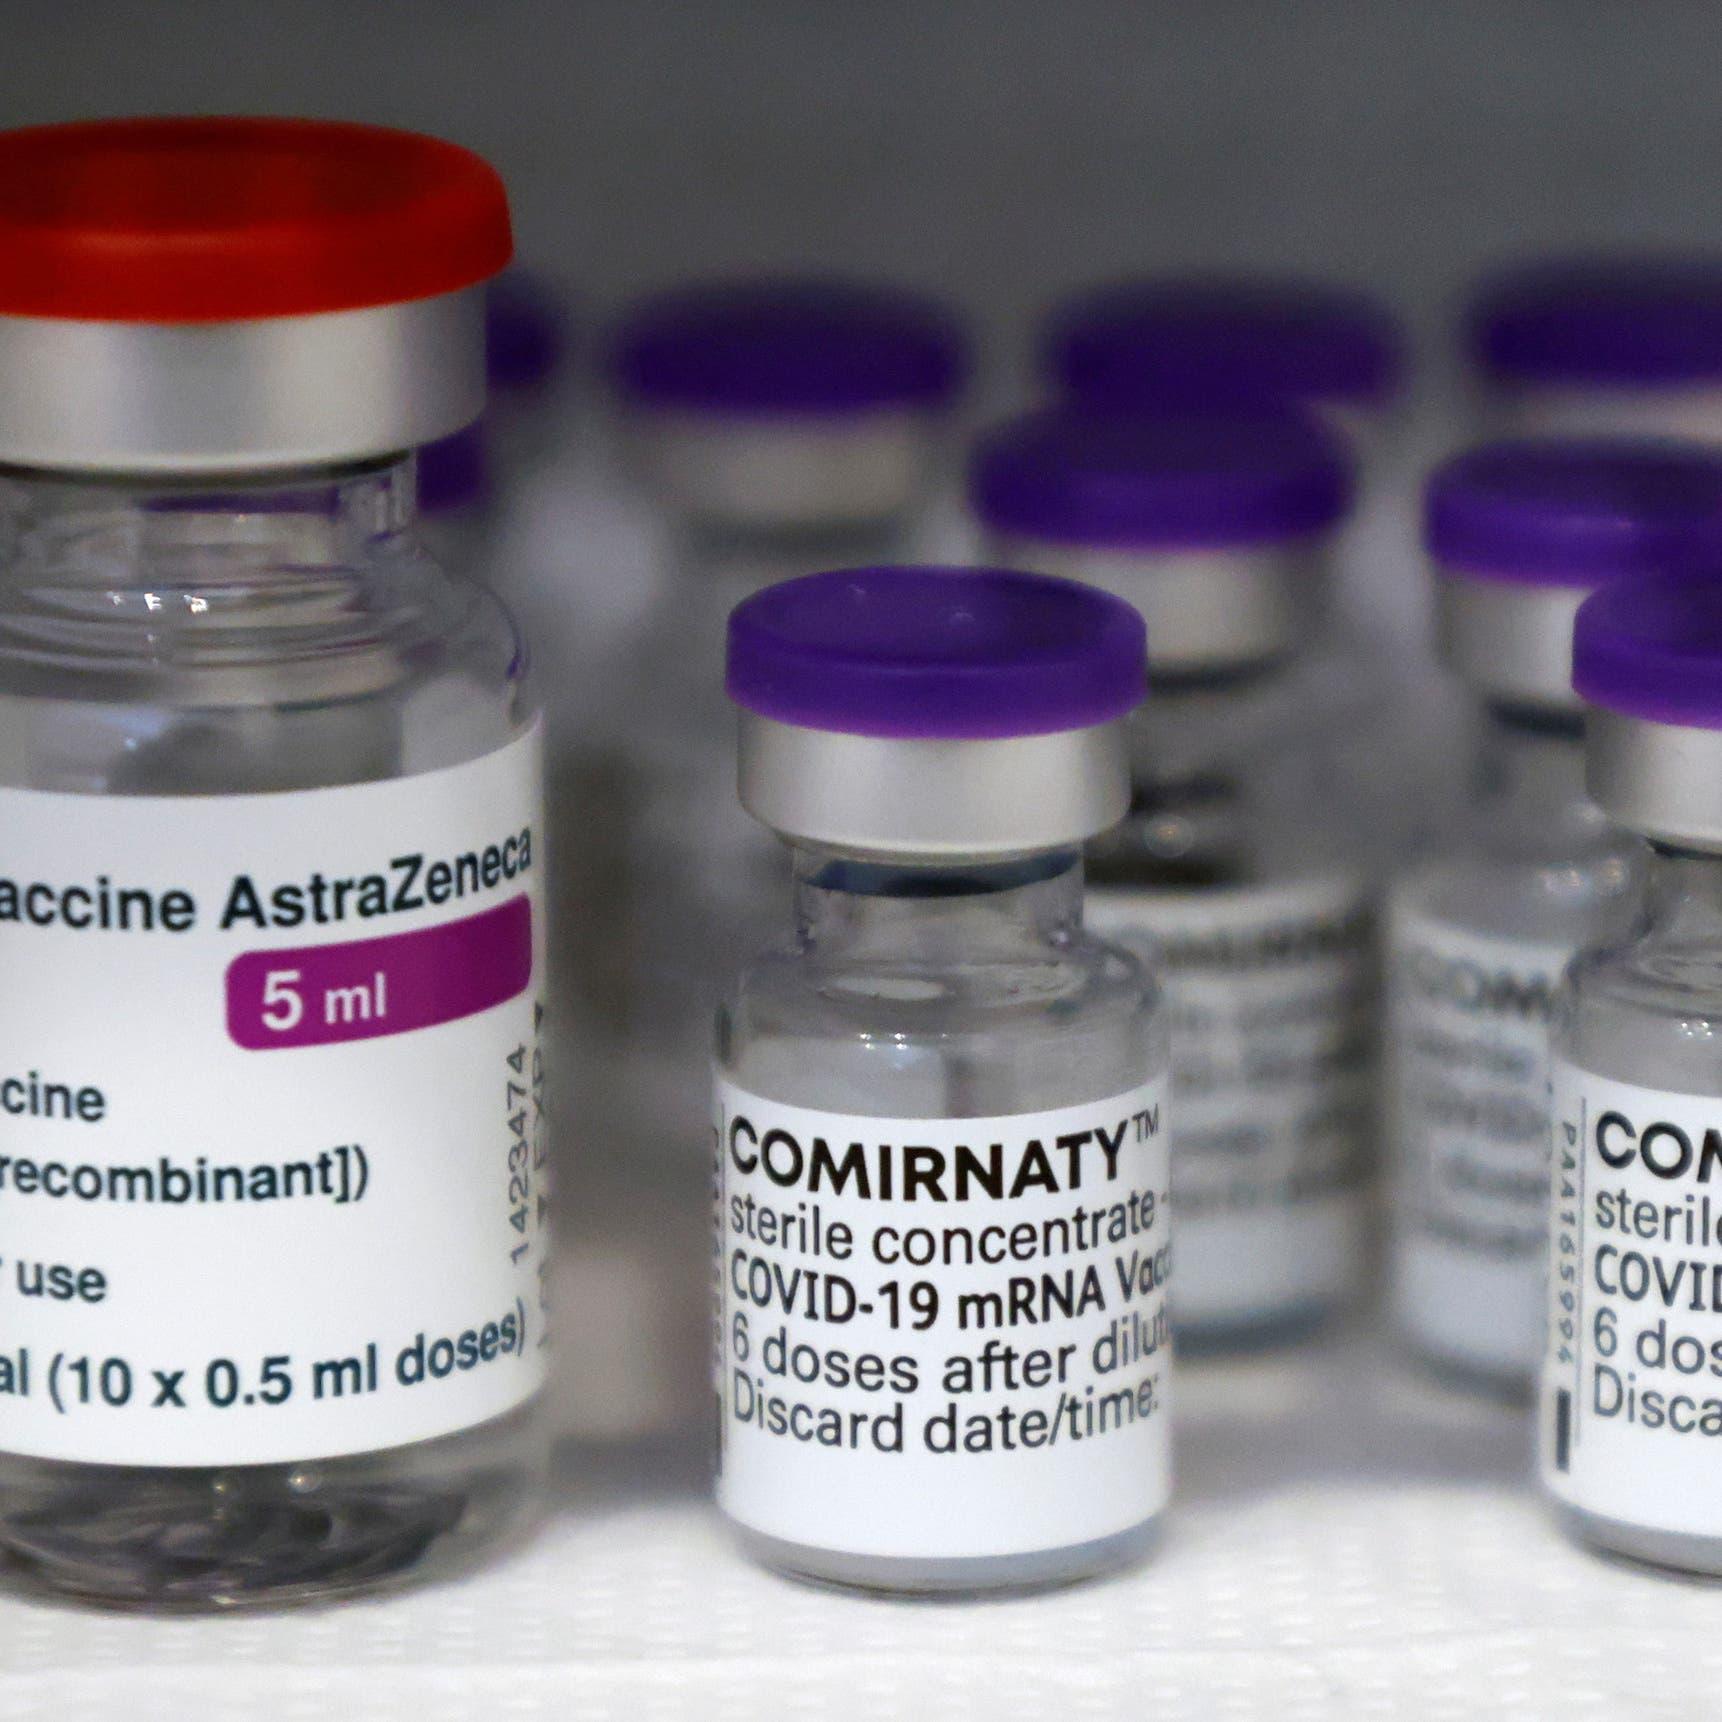 Mixing AstraZeneca, Pfizer COVID-19 vaccines boost antibody level, study finds